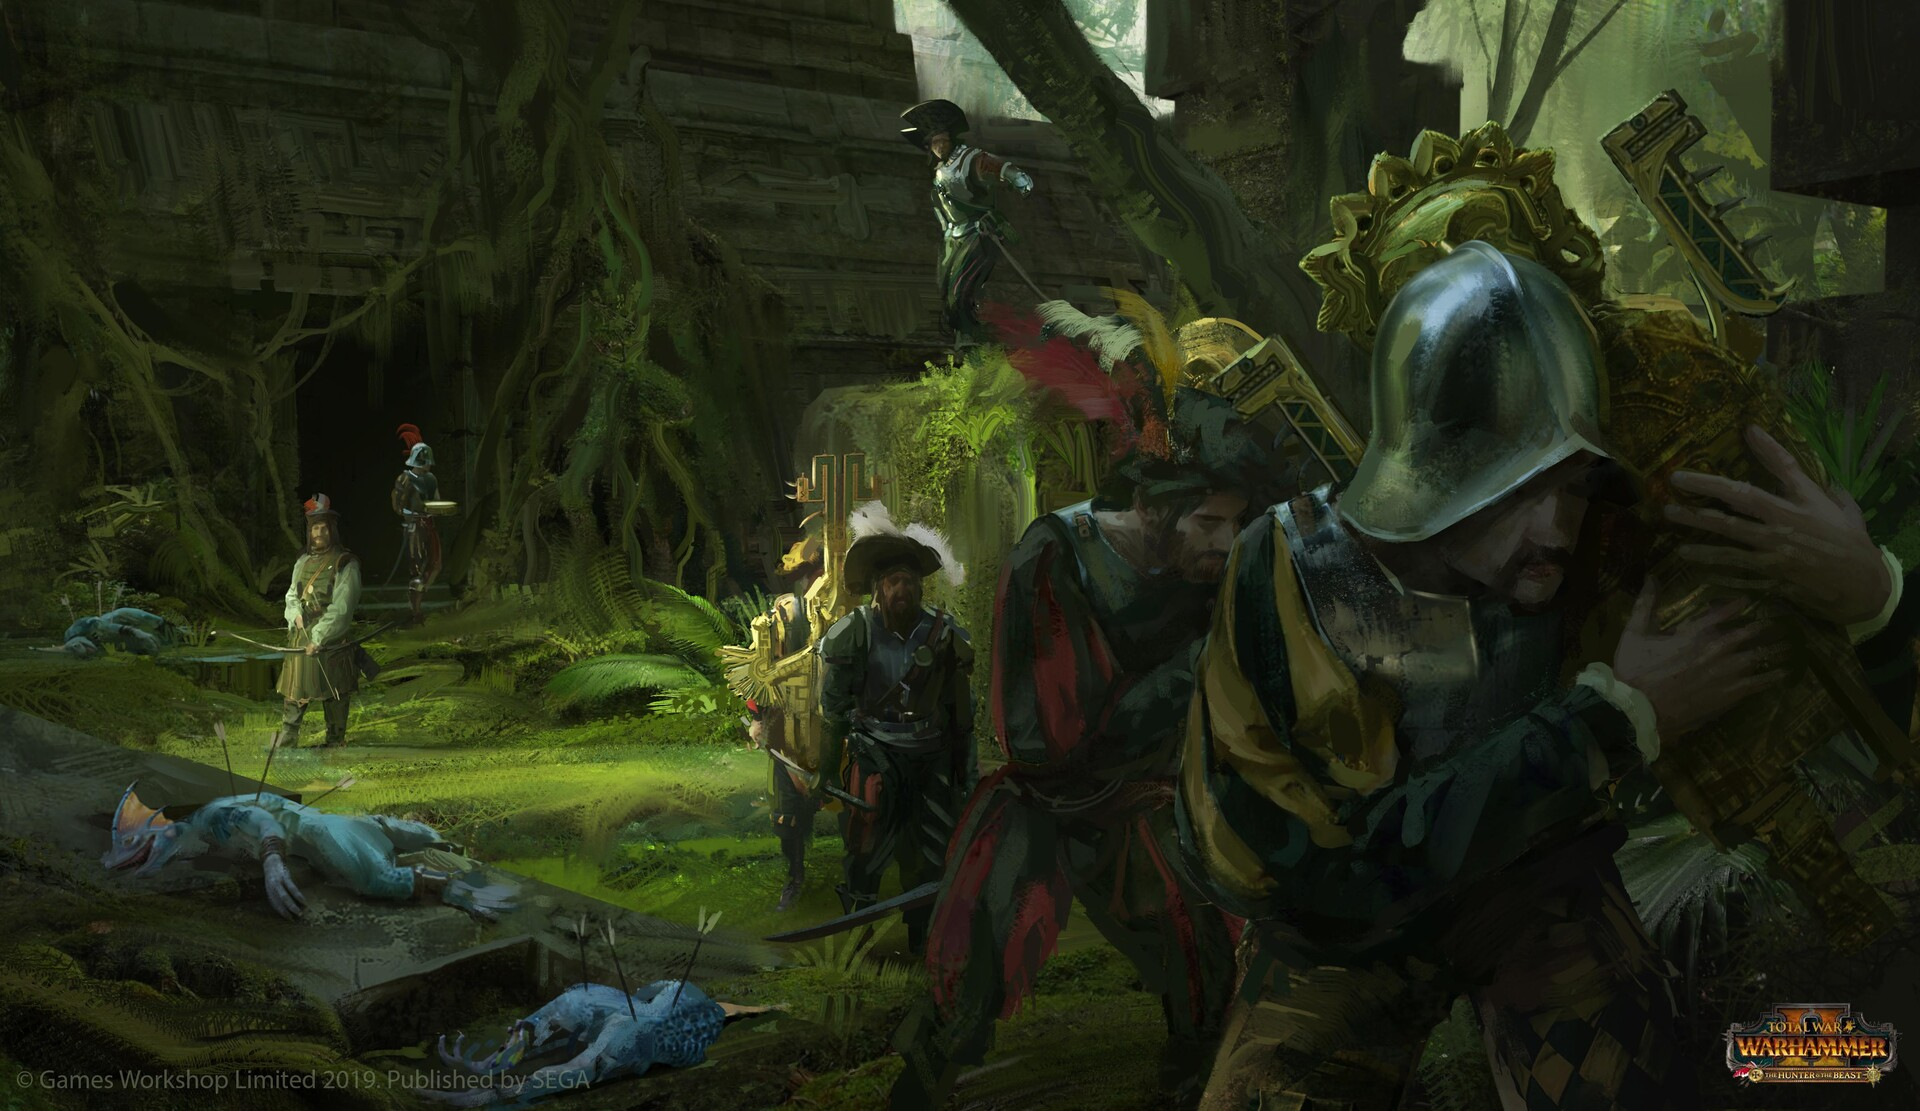 Artstation Warhammer 2 The Hunter The Beast Release Trailer Artworks Lucas Staniec The wanderer mtg art by wesley burt. artstation warhammer 2 the hunter